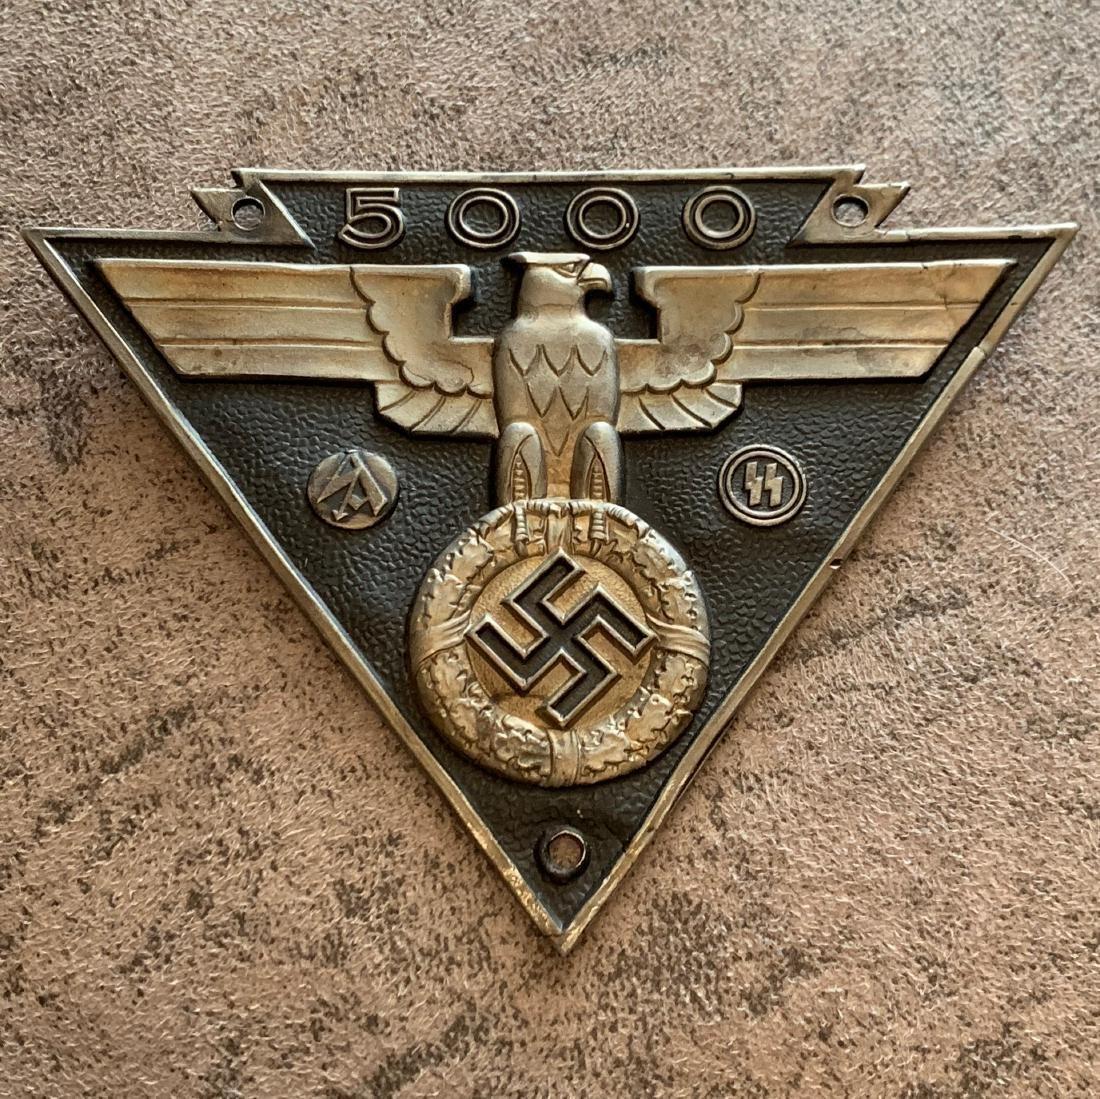 RARE WW2 NAZI WAFFEN SA WAFFEN SS 5000 MILE LICENSE